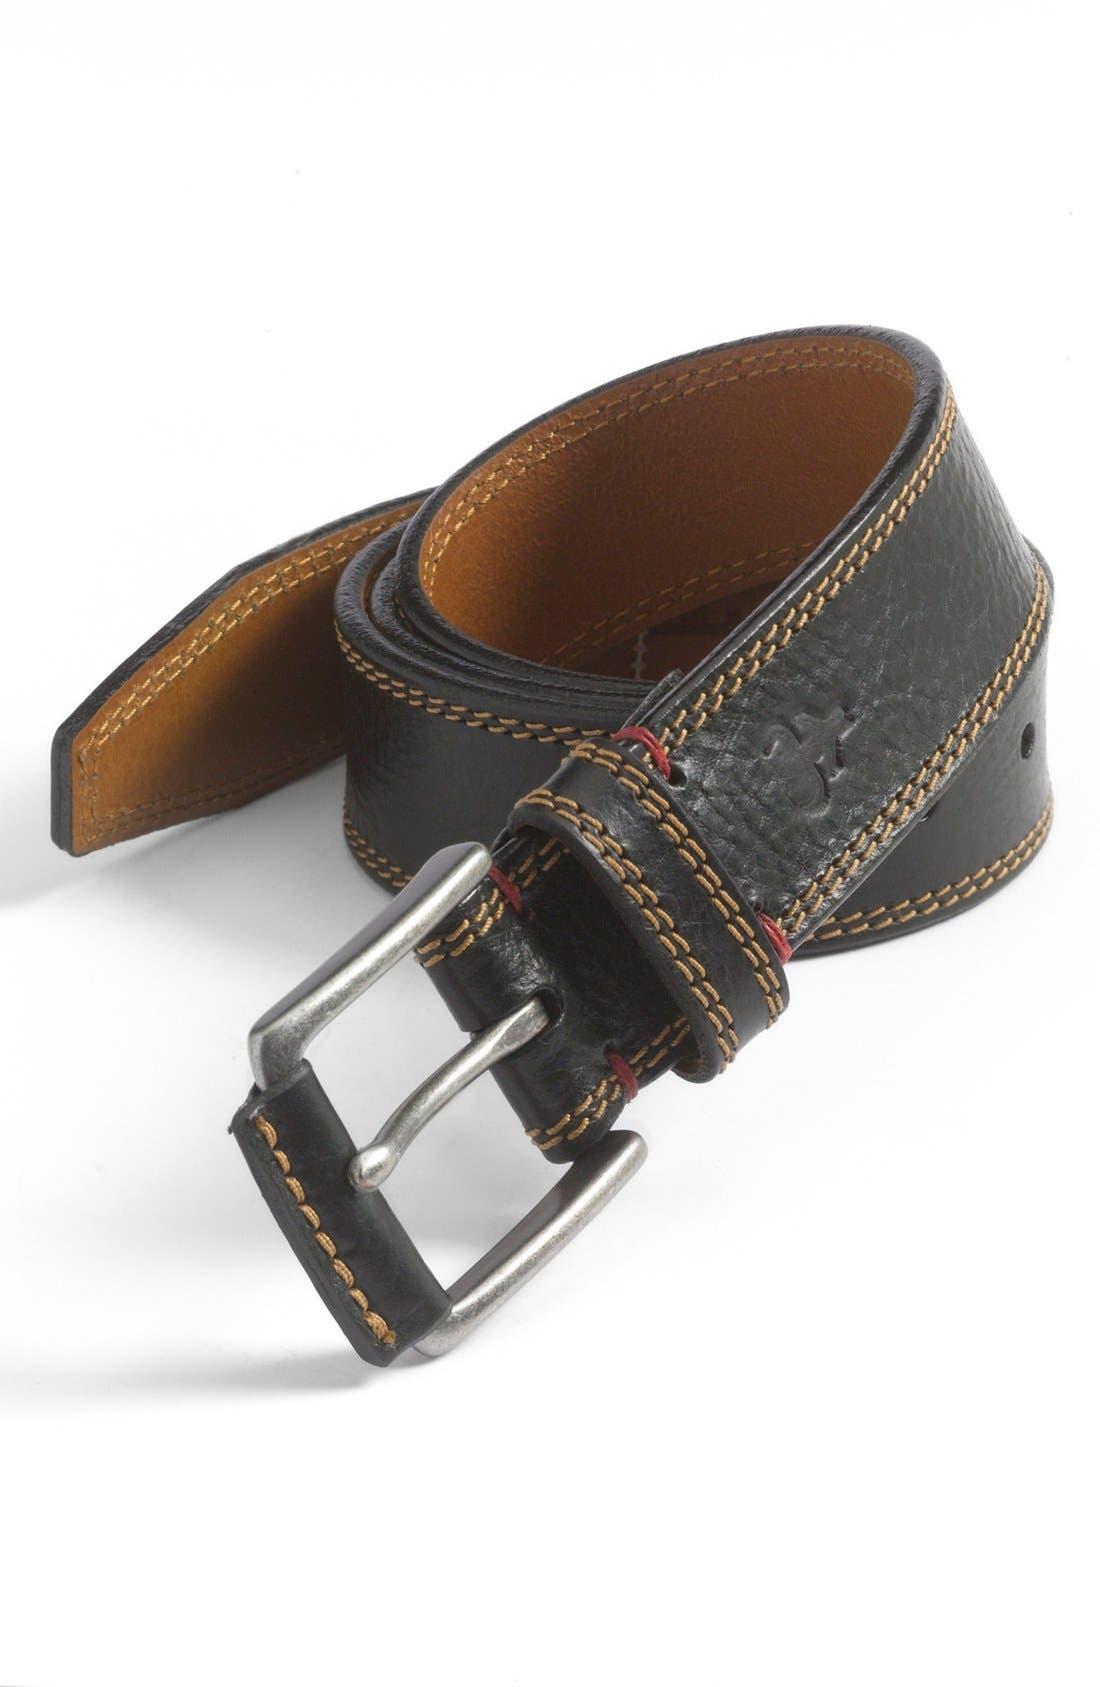 TRASK Gallatin Belt